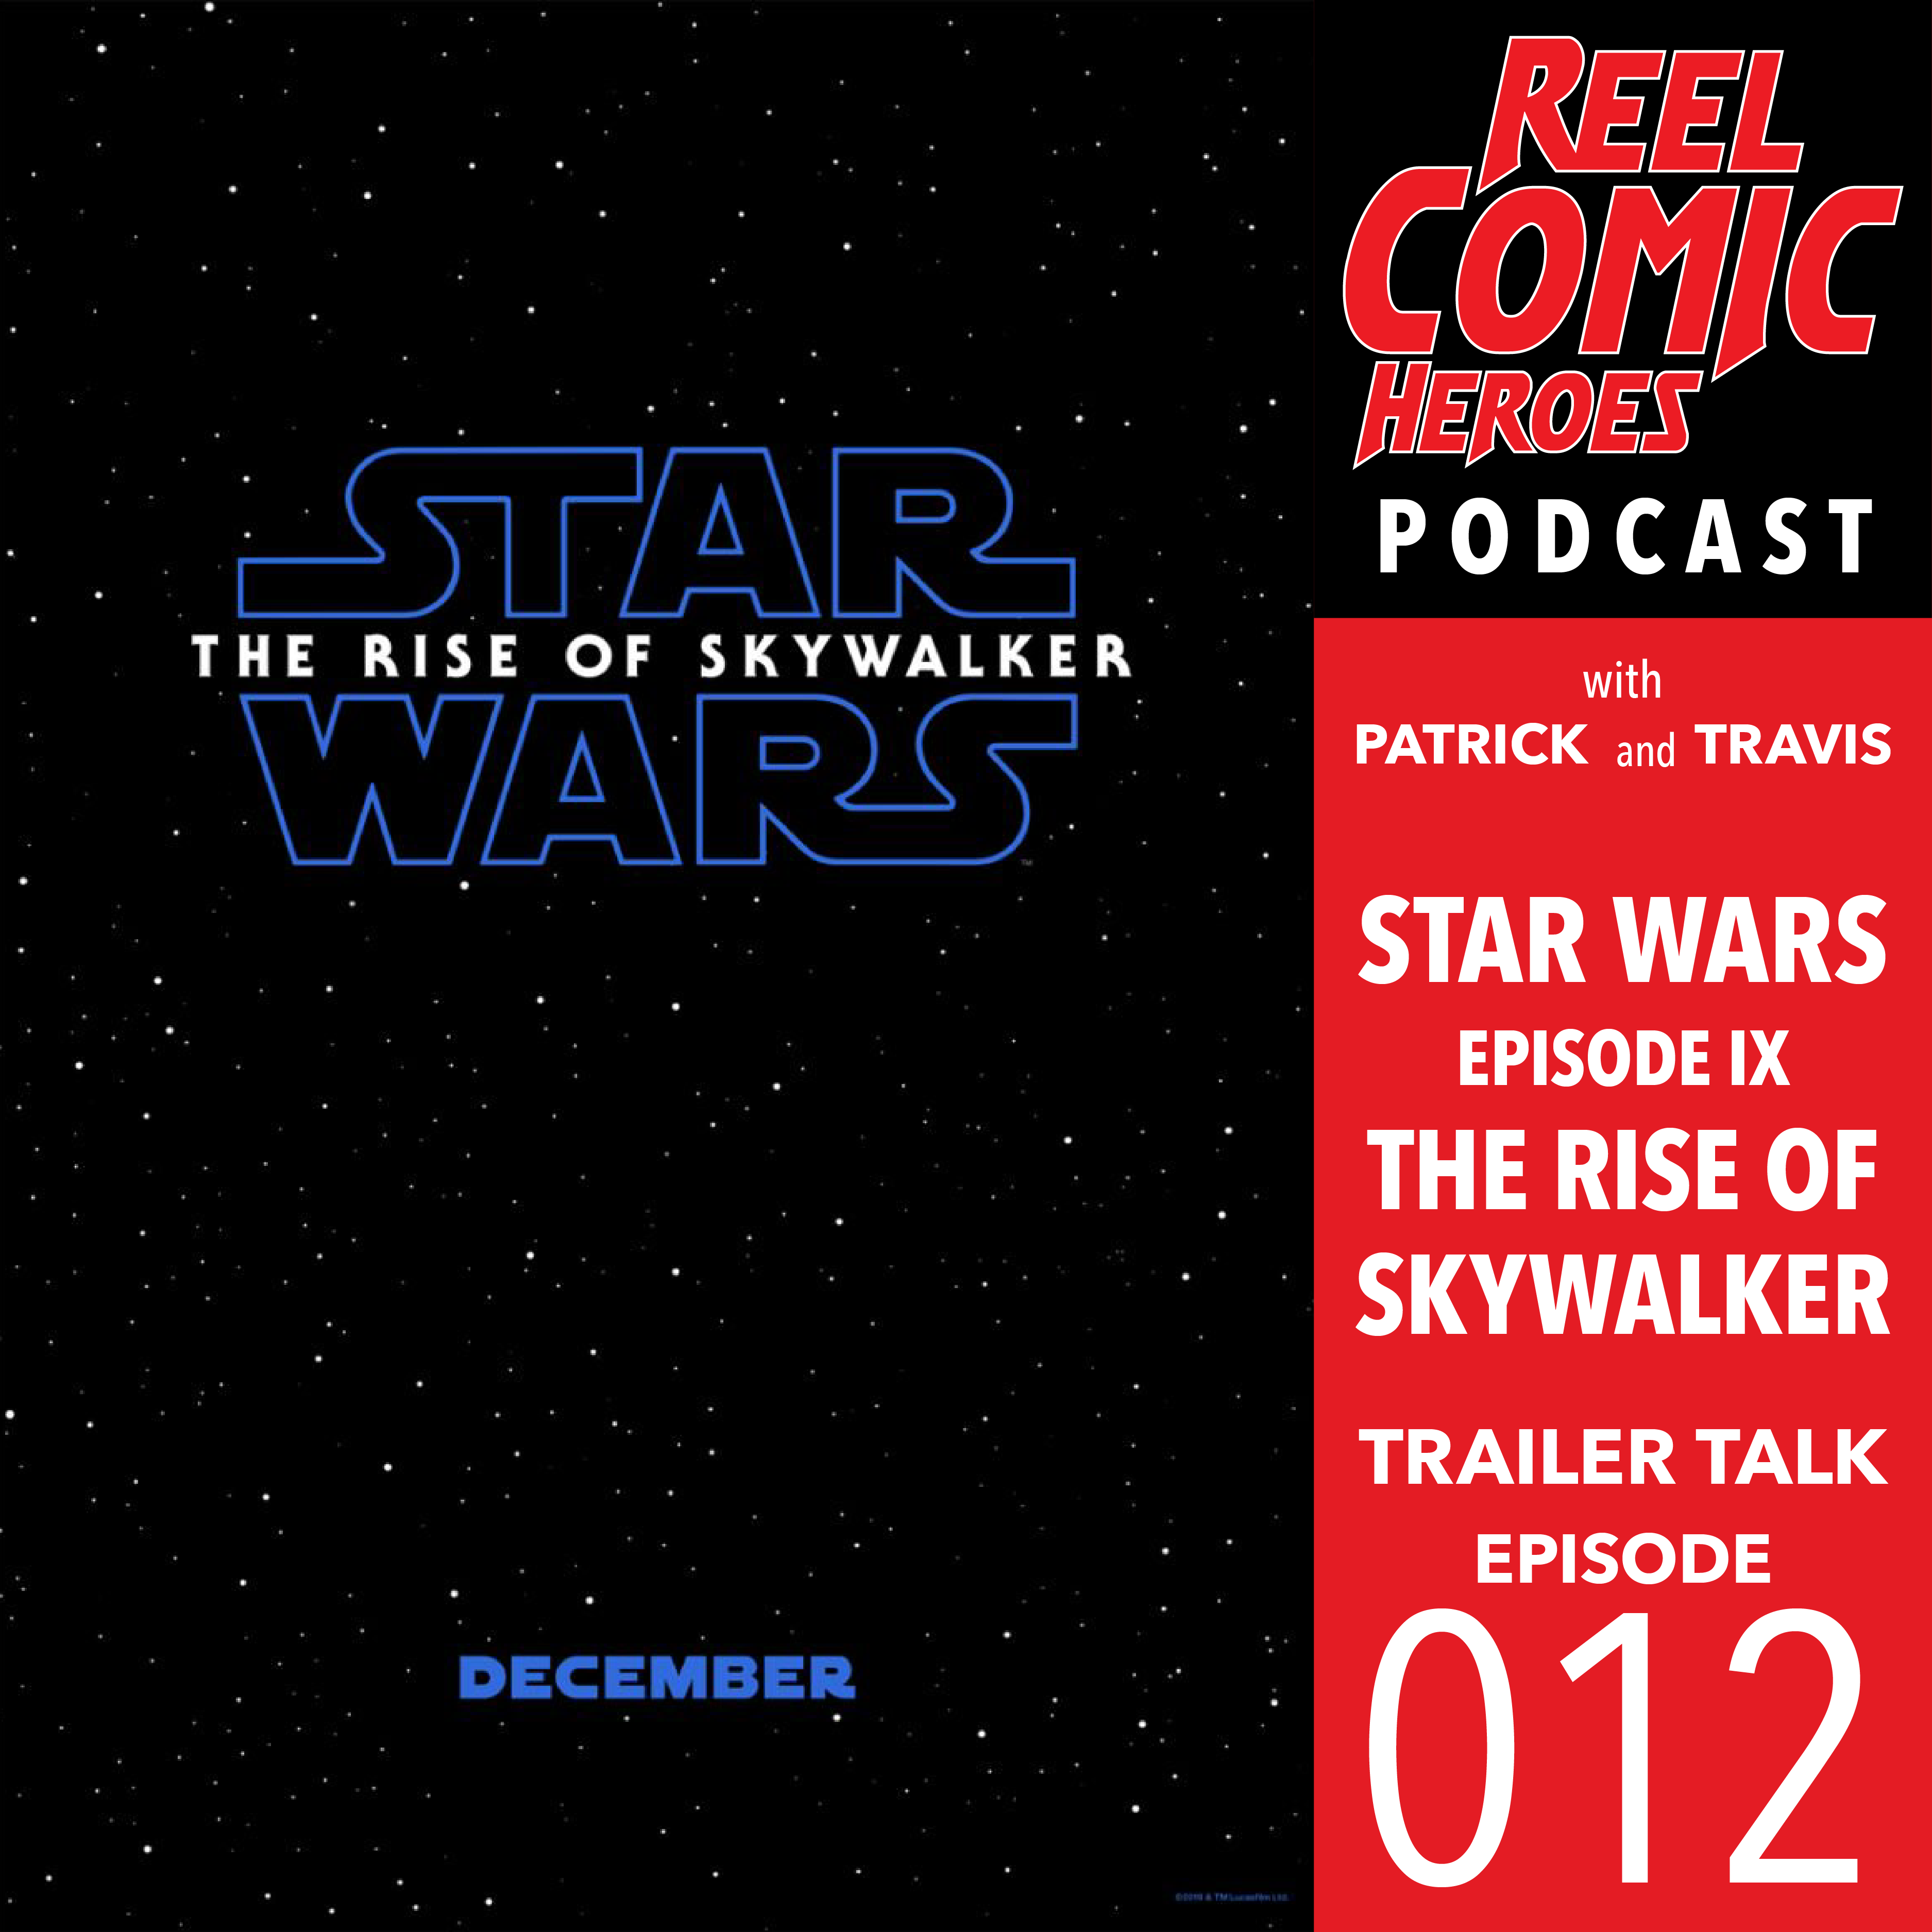 Artwork for Reel Comic Heroes: Trailer Talk 012 - Star Wars: Episode IX - The Rise of Skywalker